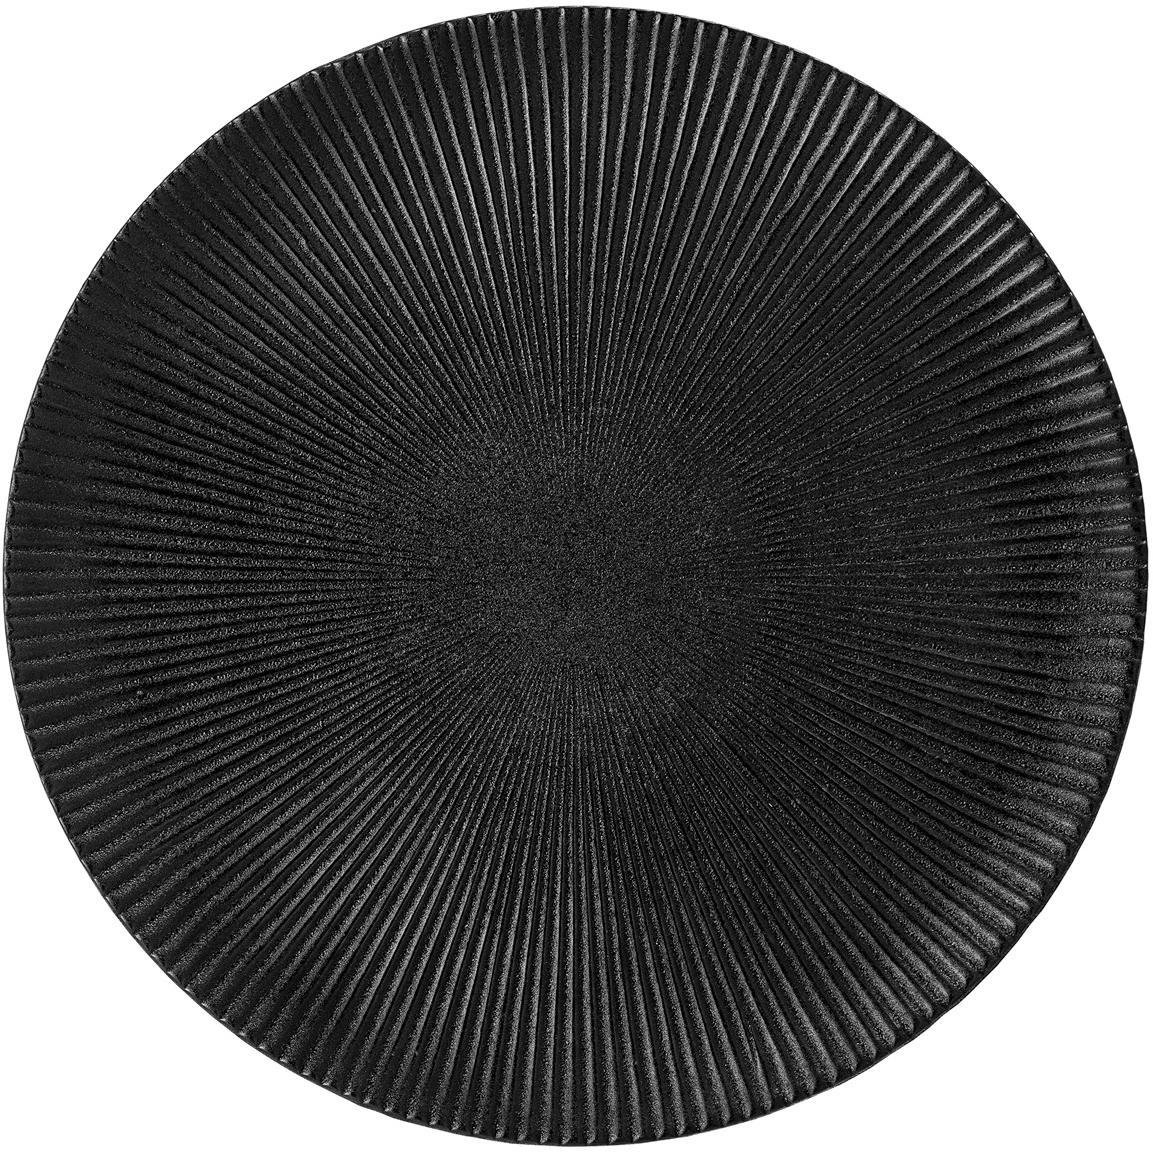 Dinerbord Neri met groefstructuur in mat zwart, Keramiek, Zwart, Ø 29 cm